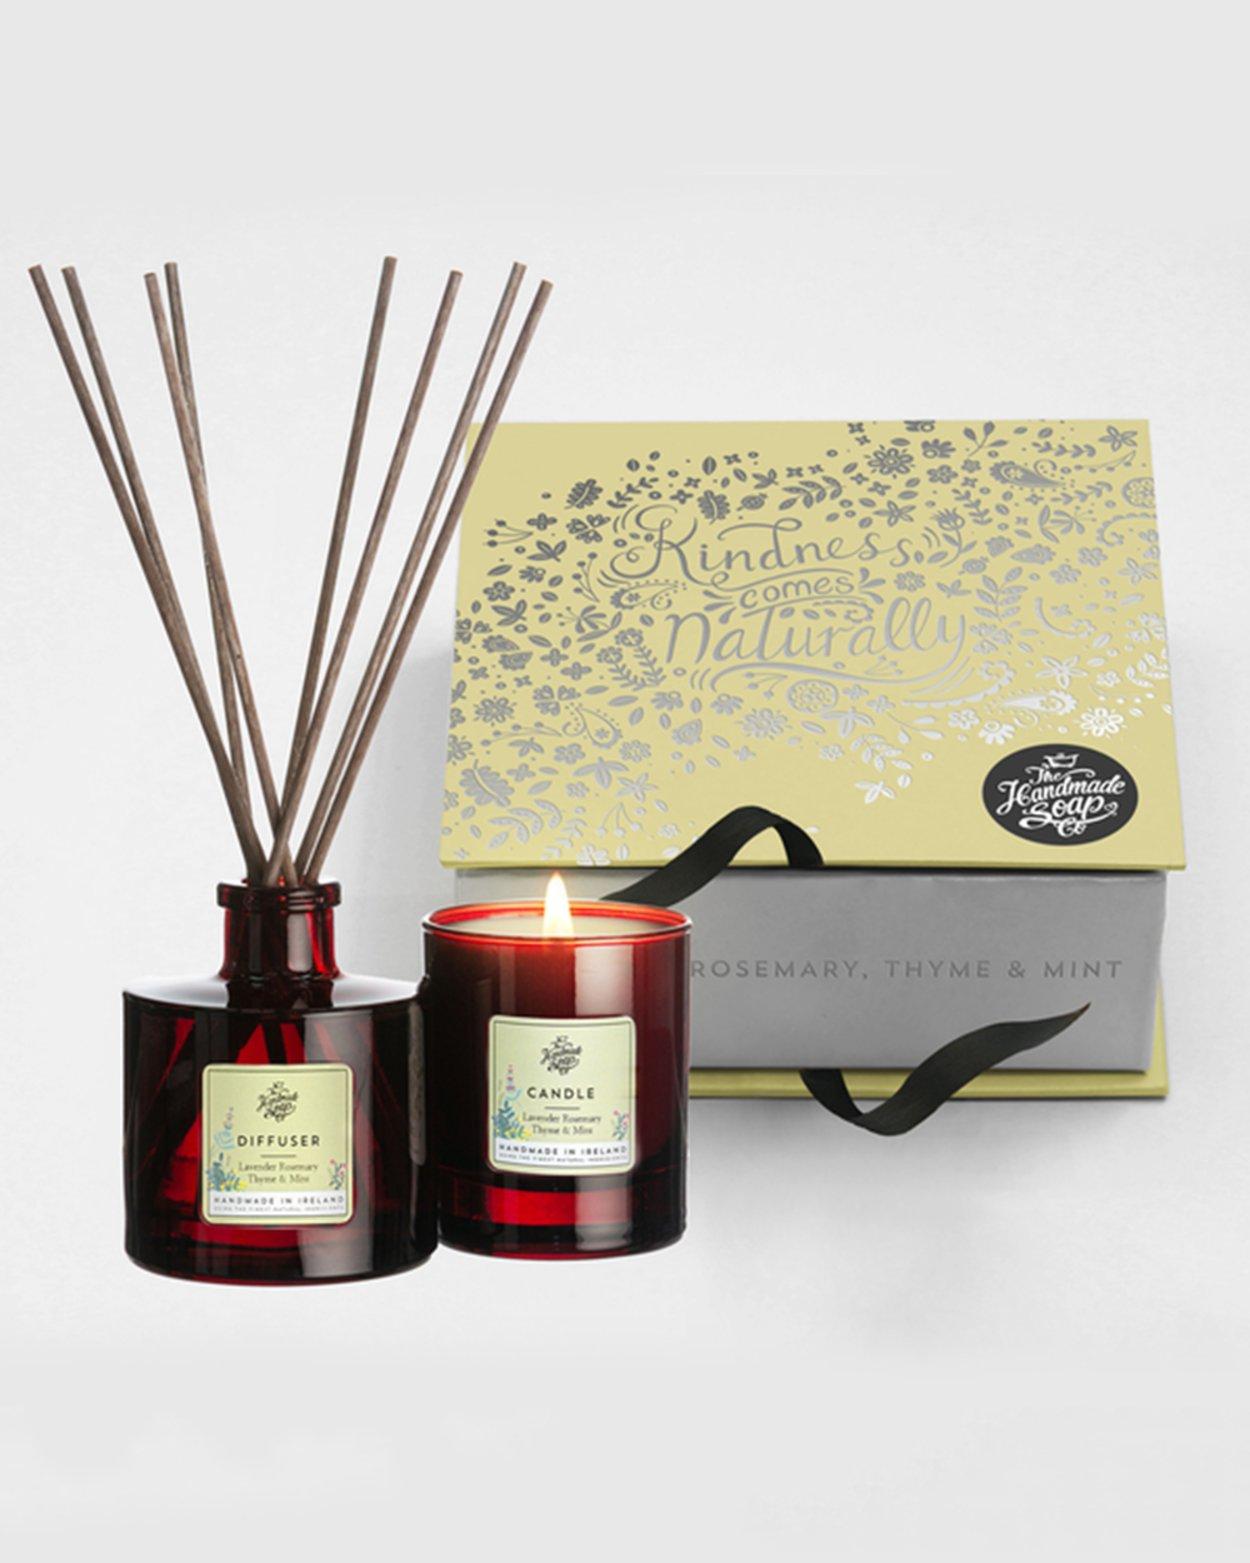 Lavender, Rosemary, Thyme & Mint Gift Set